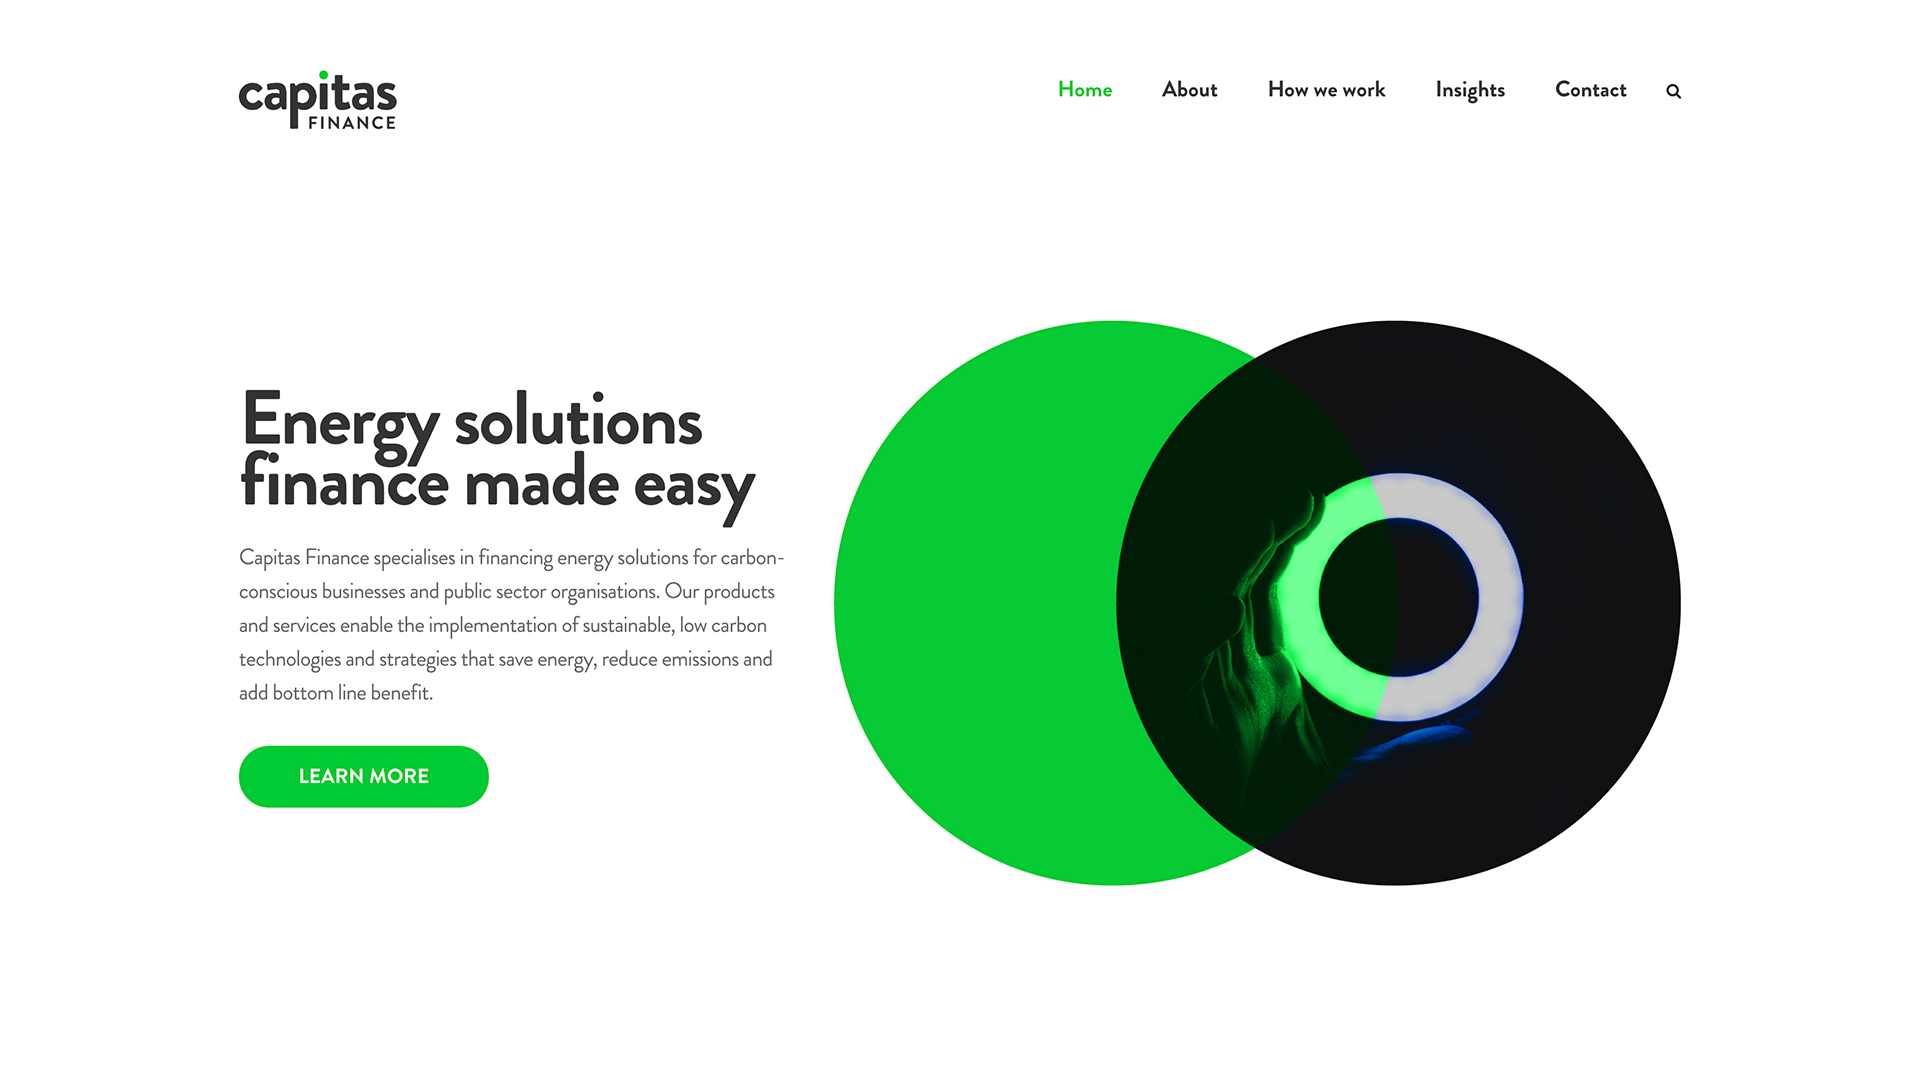 Capitas Finance website design